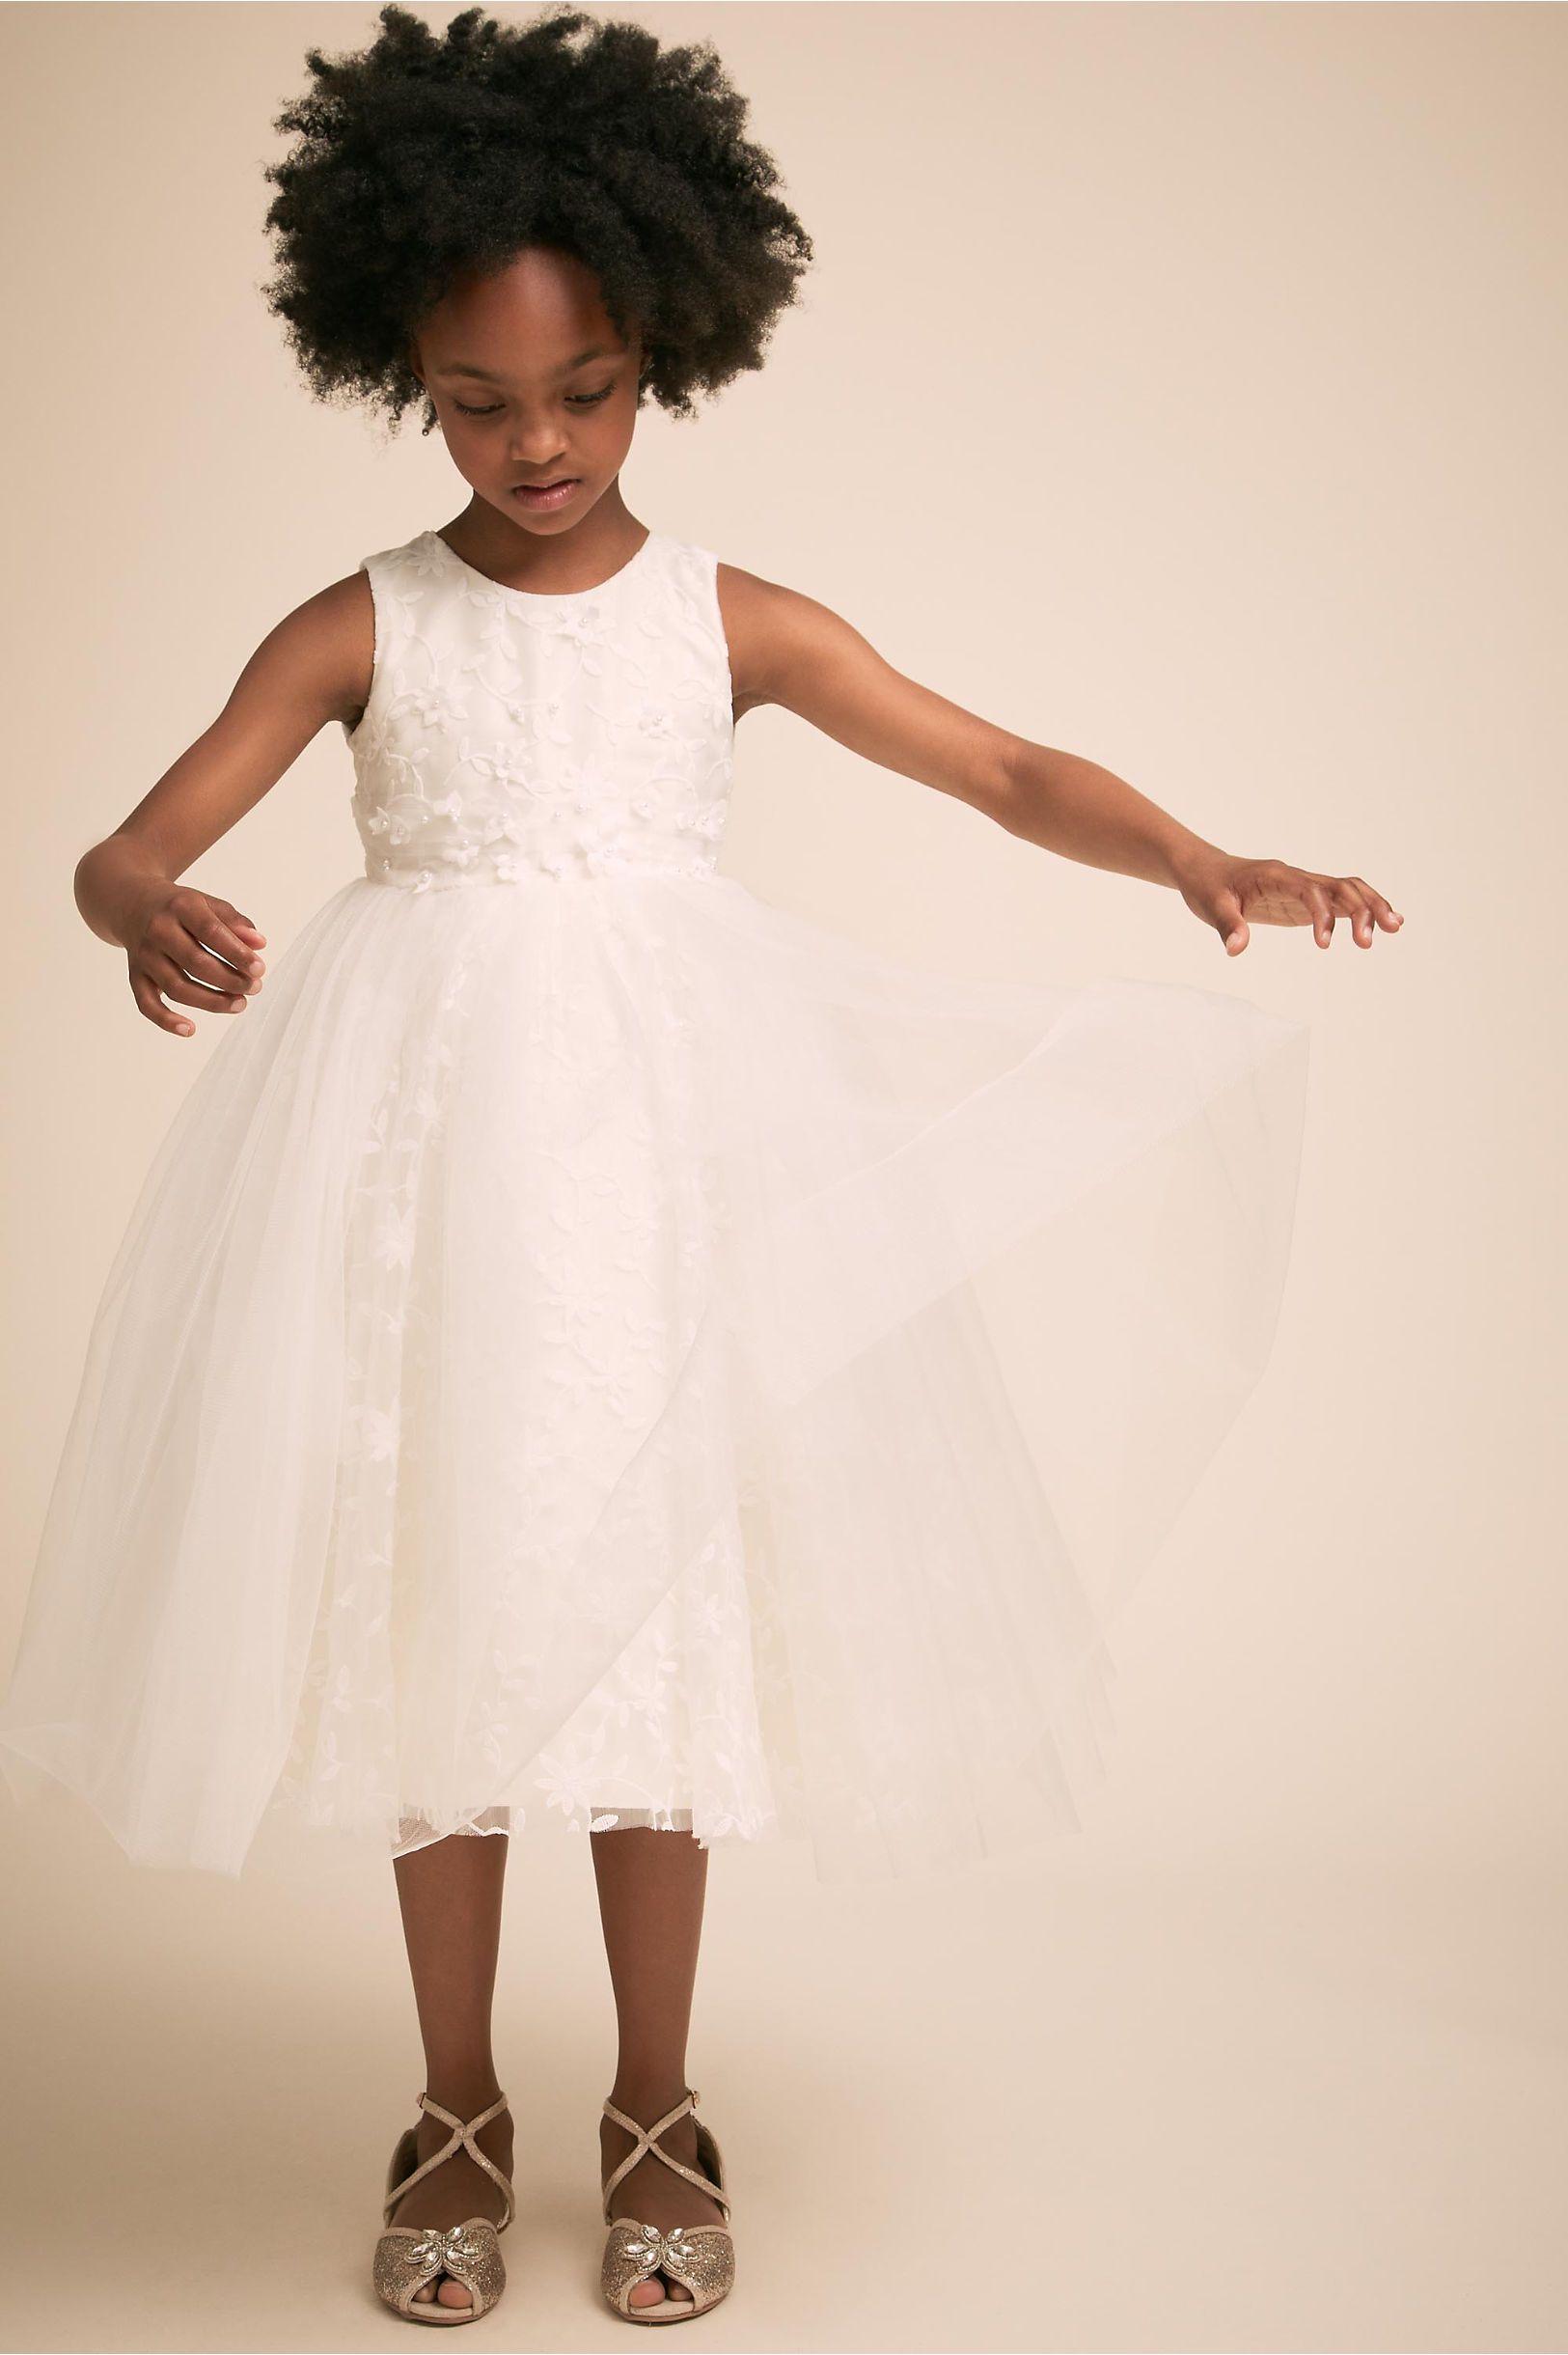 d68226ac7f7 Jessie Dress Ivory in Bridal Party